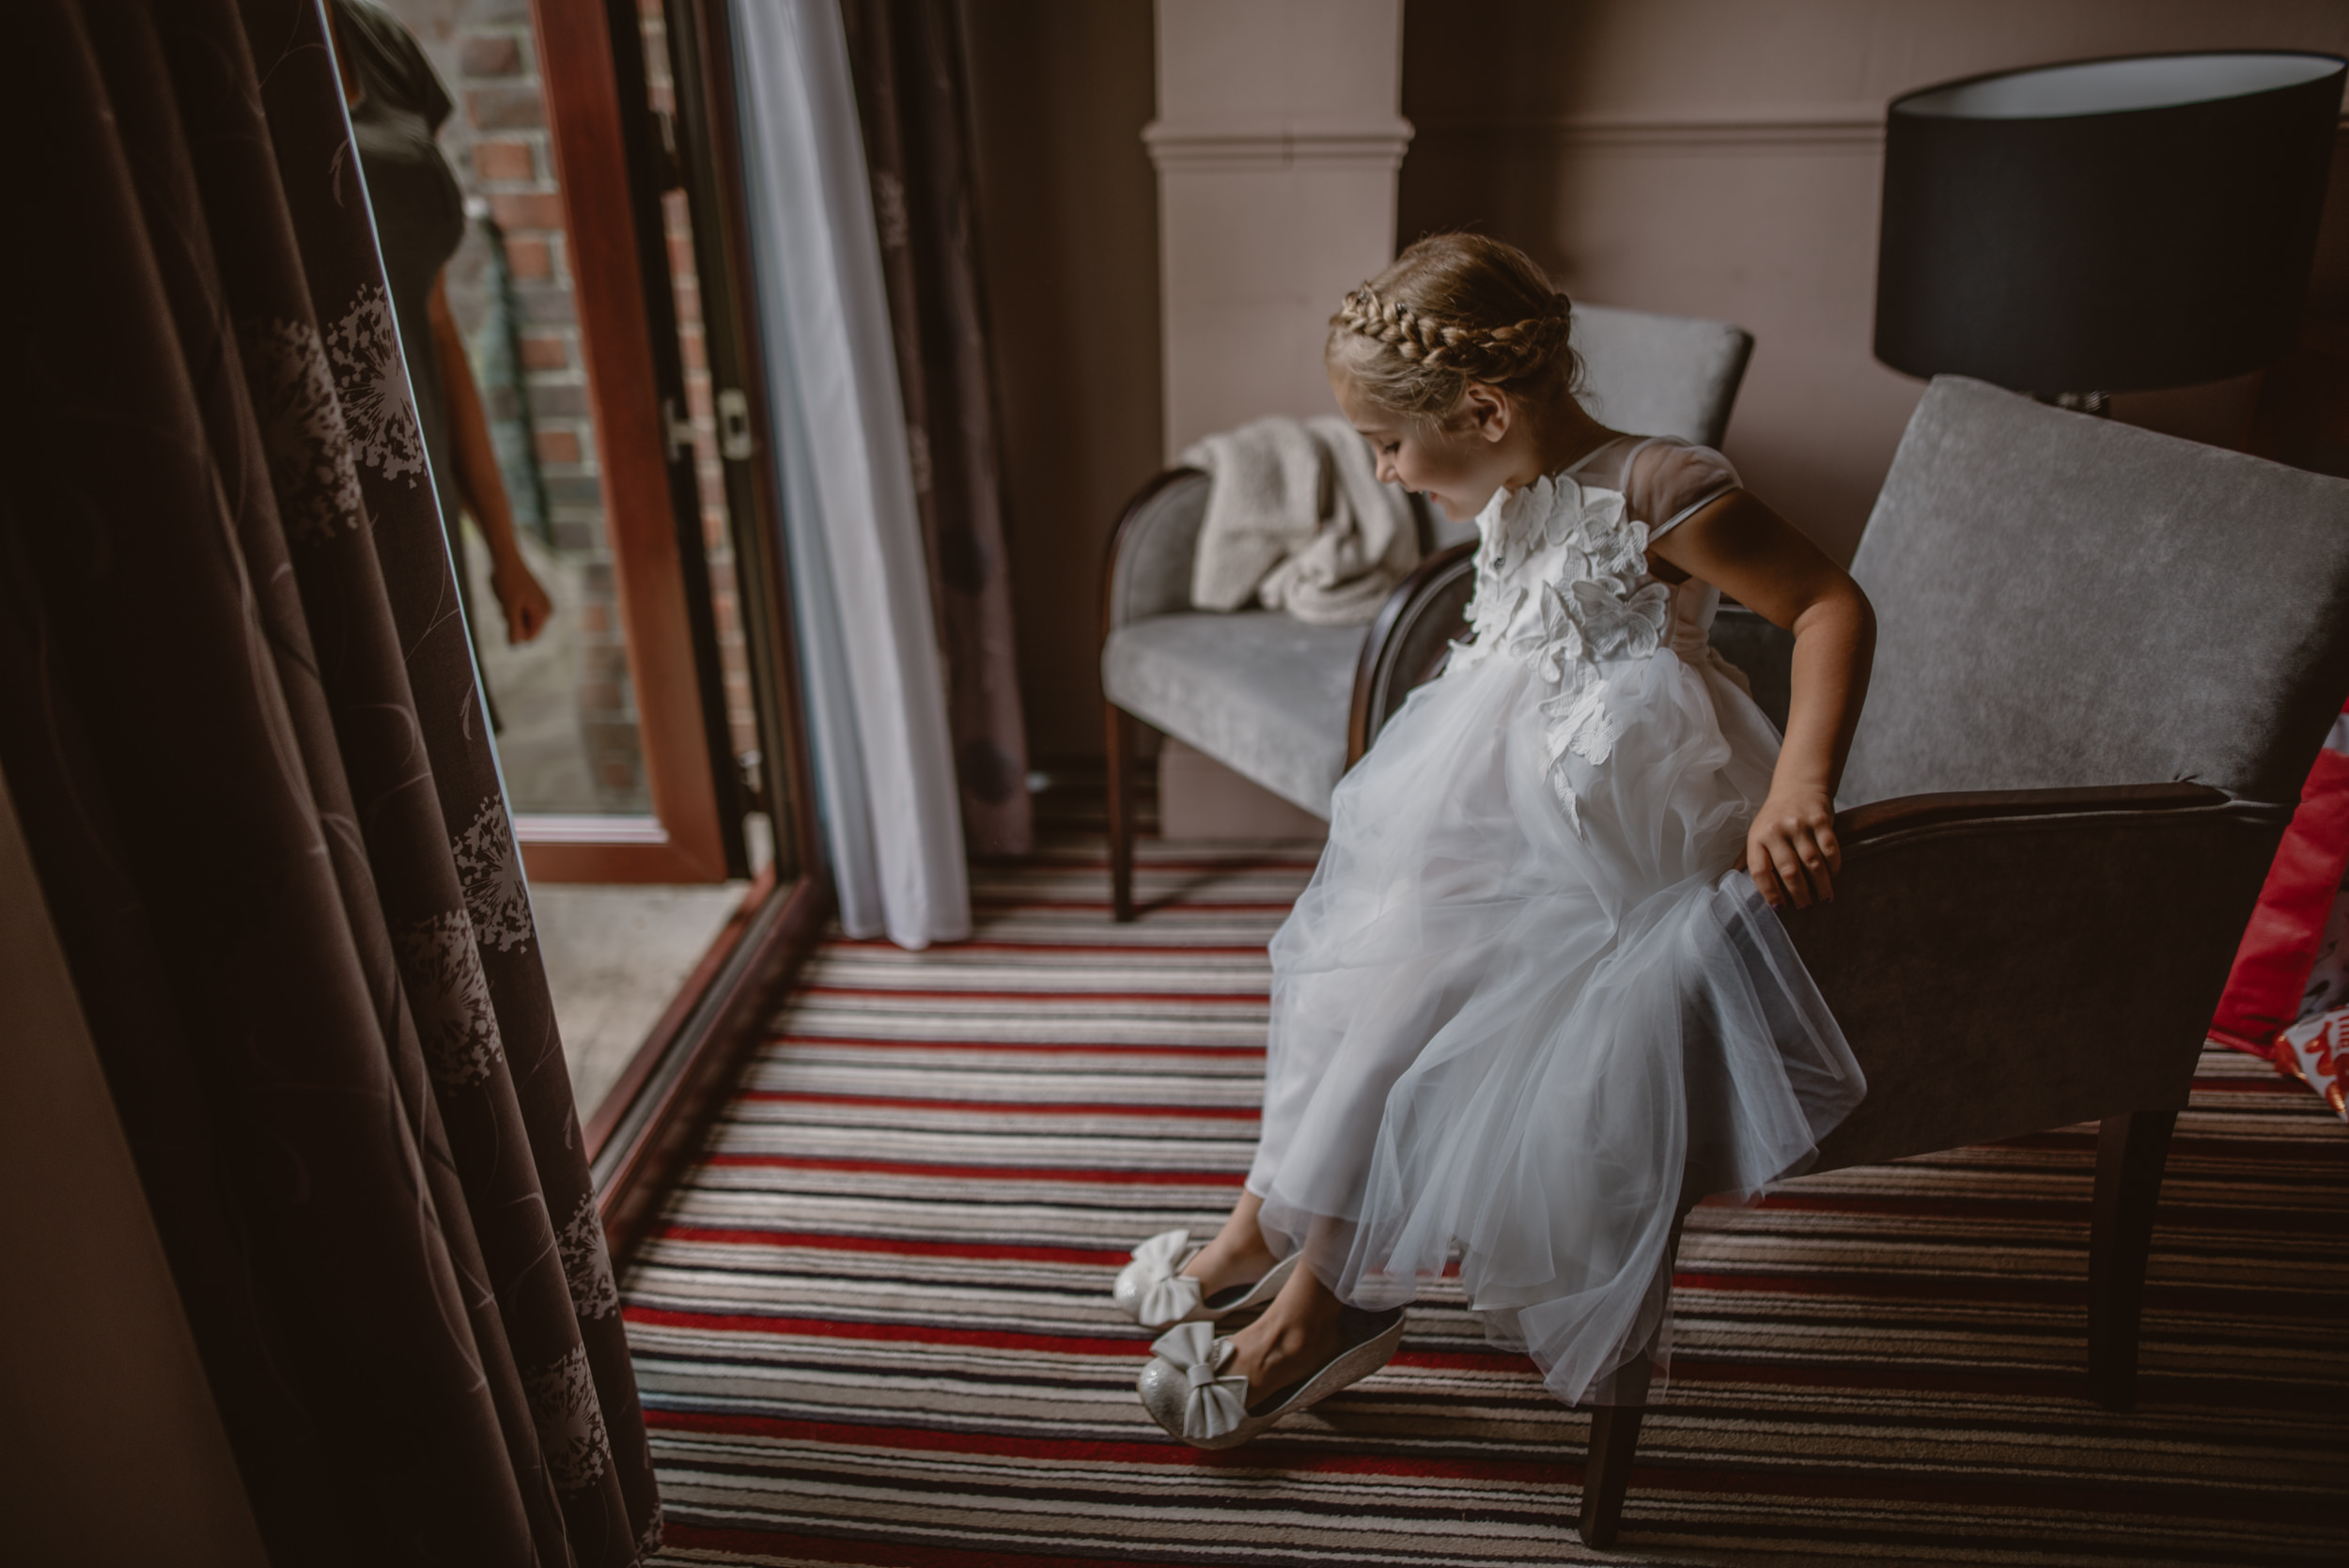 Chantelle-and-Stephen-Old-Thorns-Hotel-Wedding-Liphook-Manu-Mendoza-Wedding-Photography-114.jpg